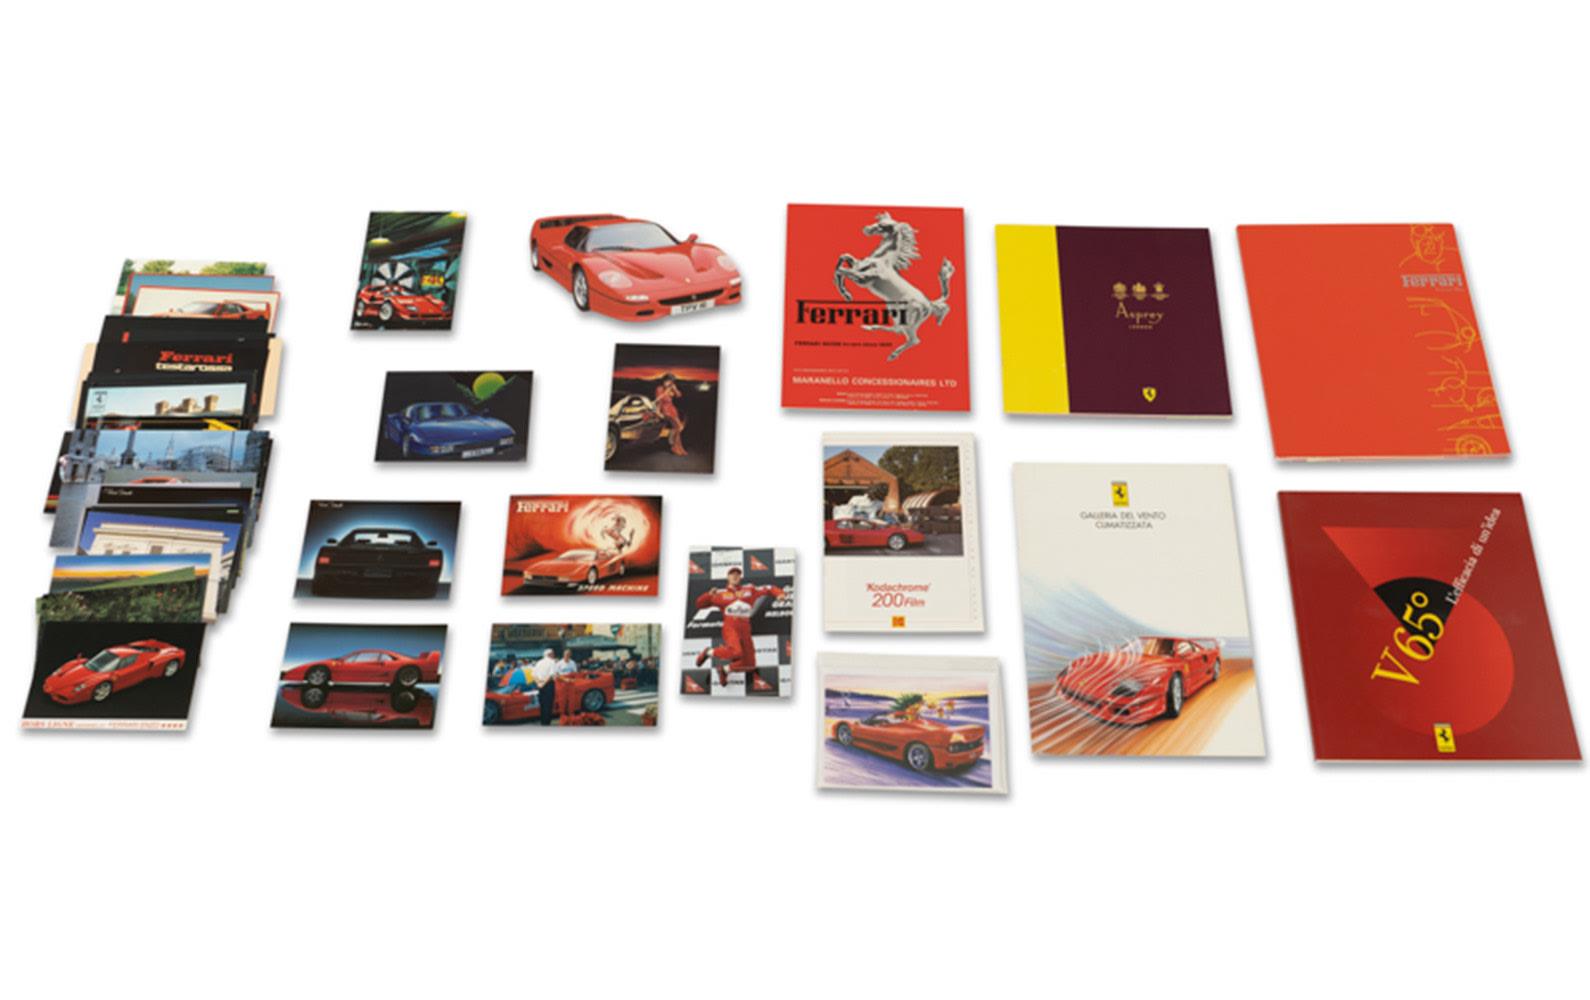 Assorted Ferrari Postcards and Literature, Including Asprey Brochure Featuring Ferrari Branded Items